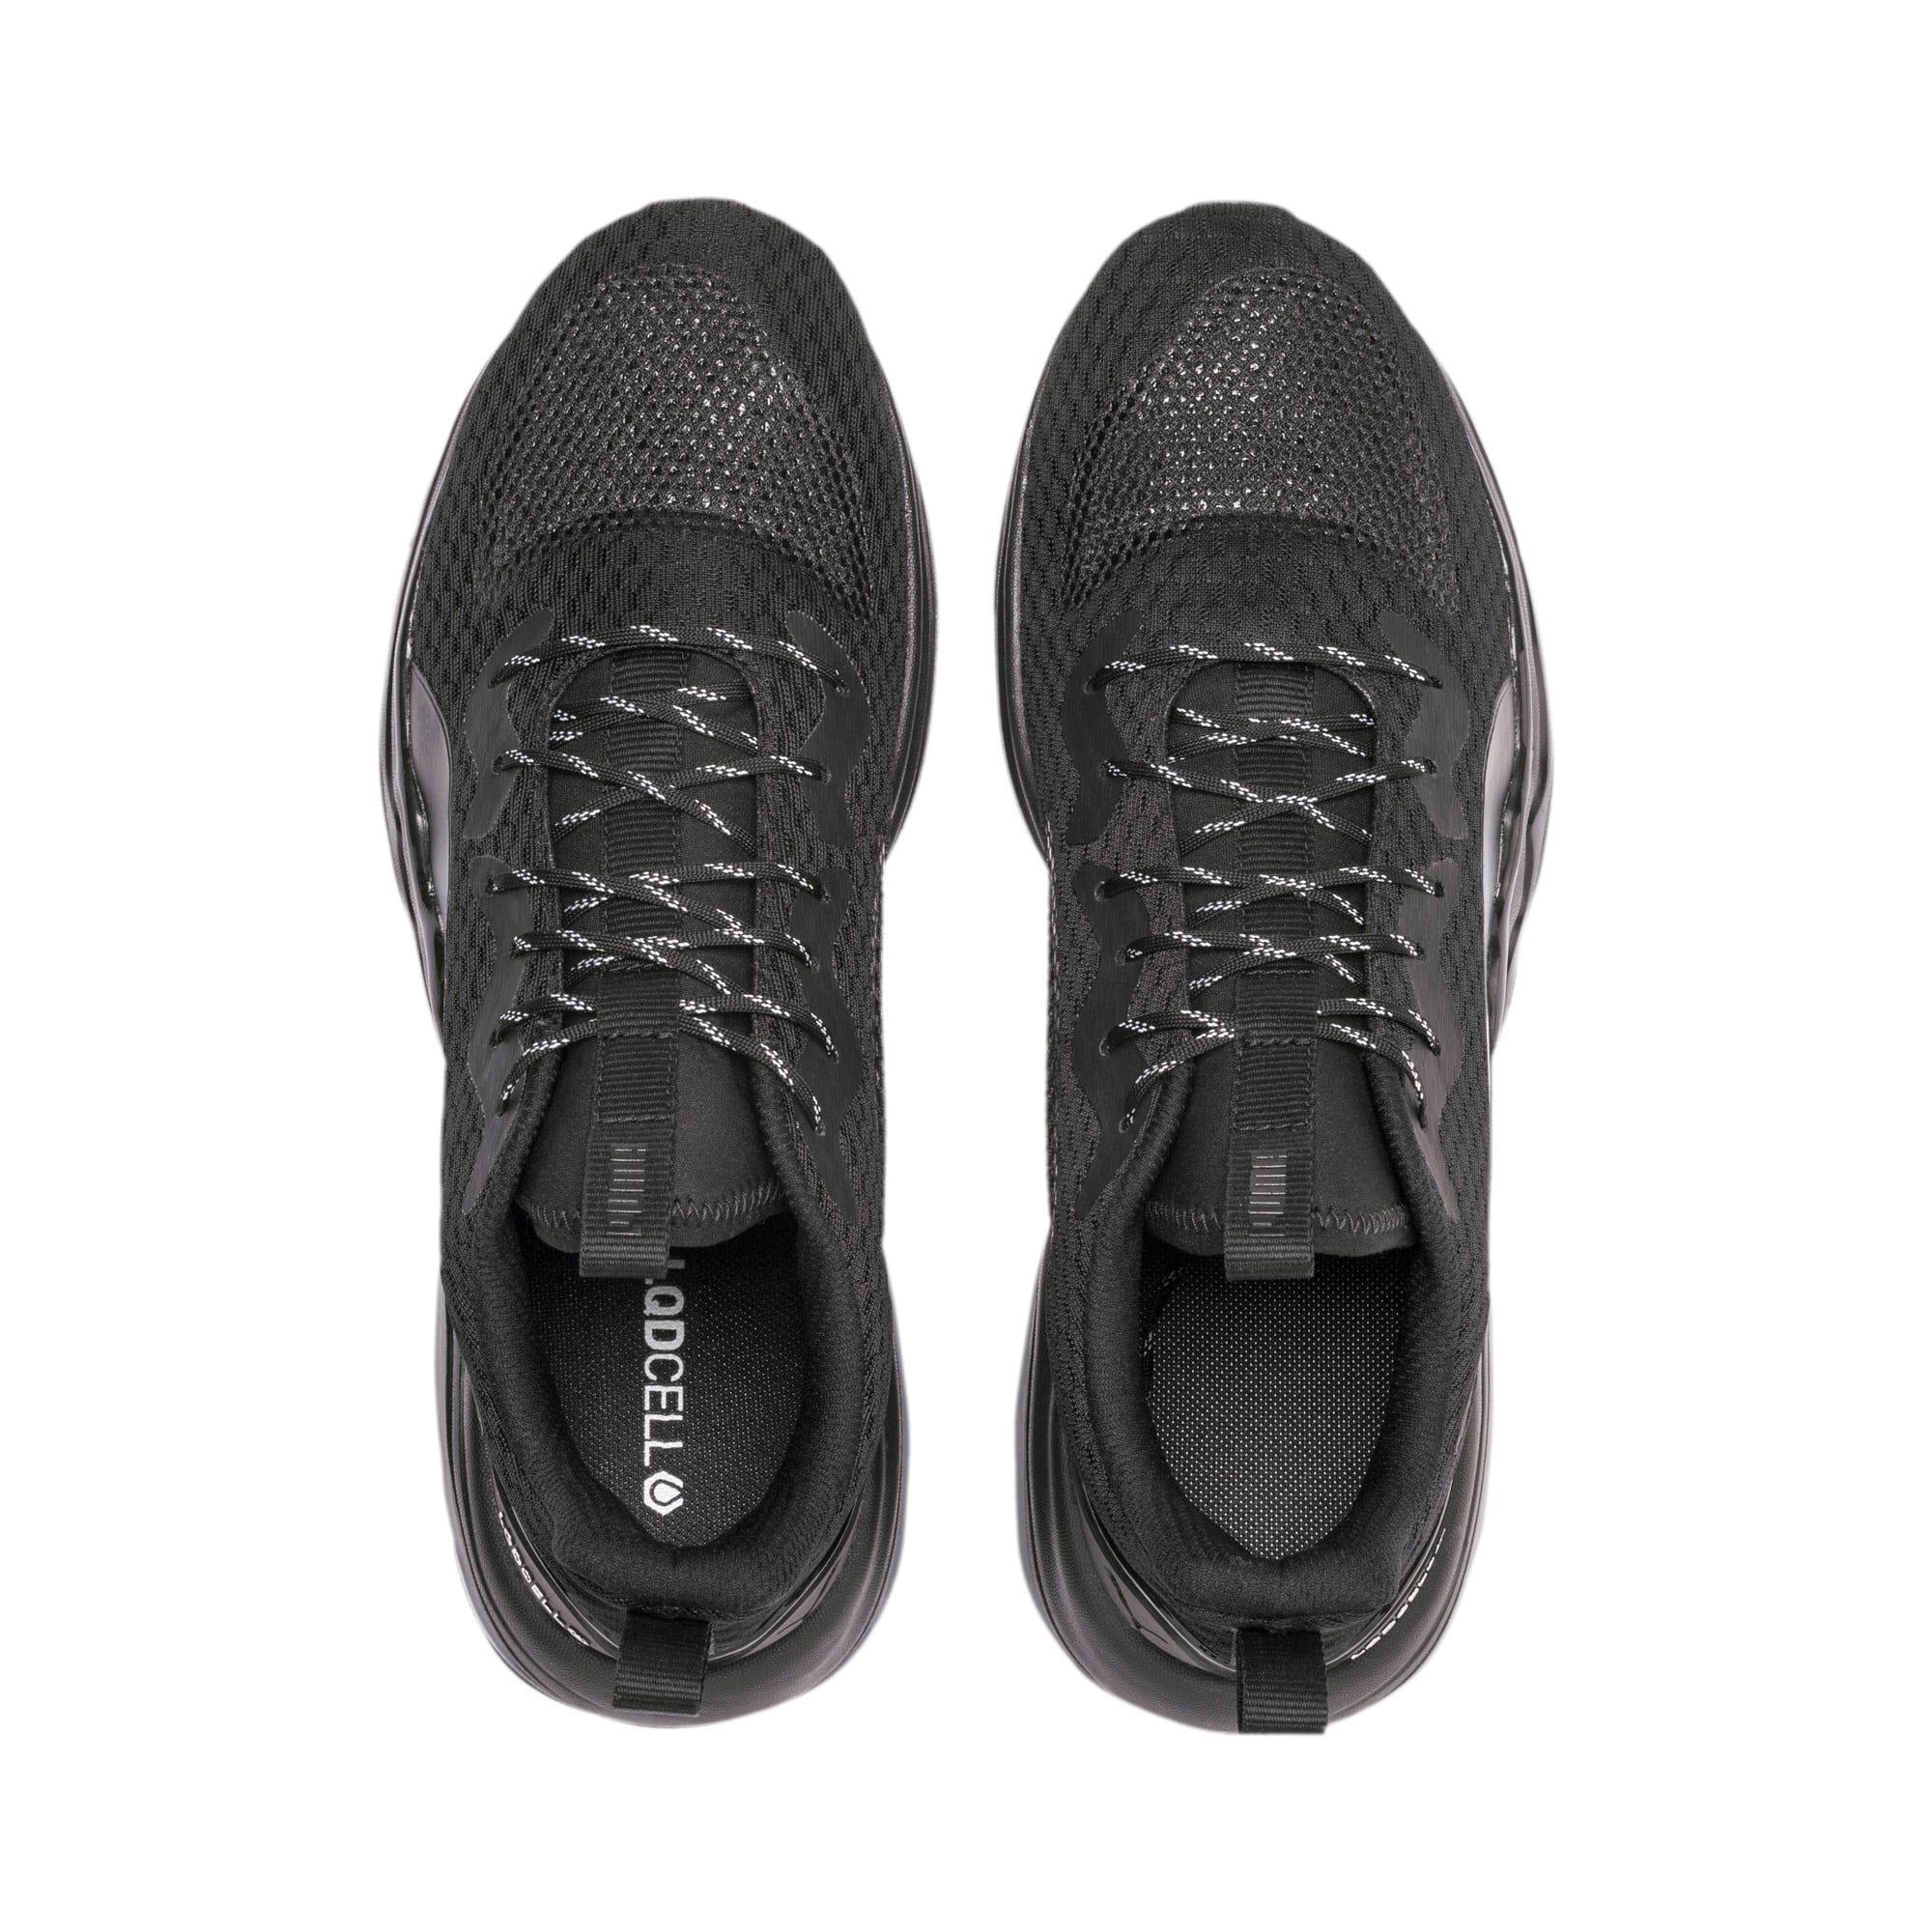 Thumbnail 8 of LQDCELL Tension Men's Training Shoes, Puma Black-Nrgy Red, medium